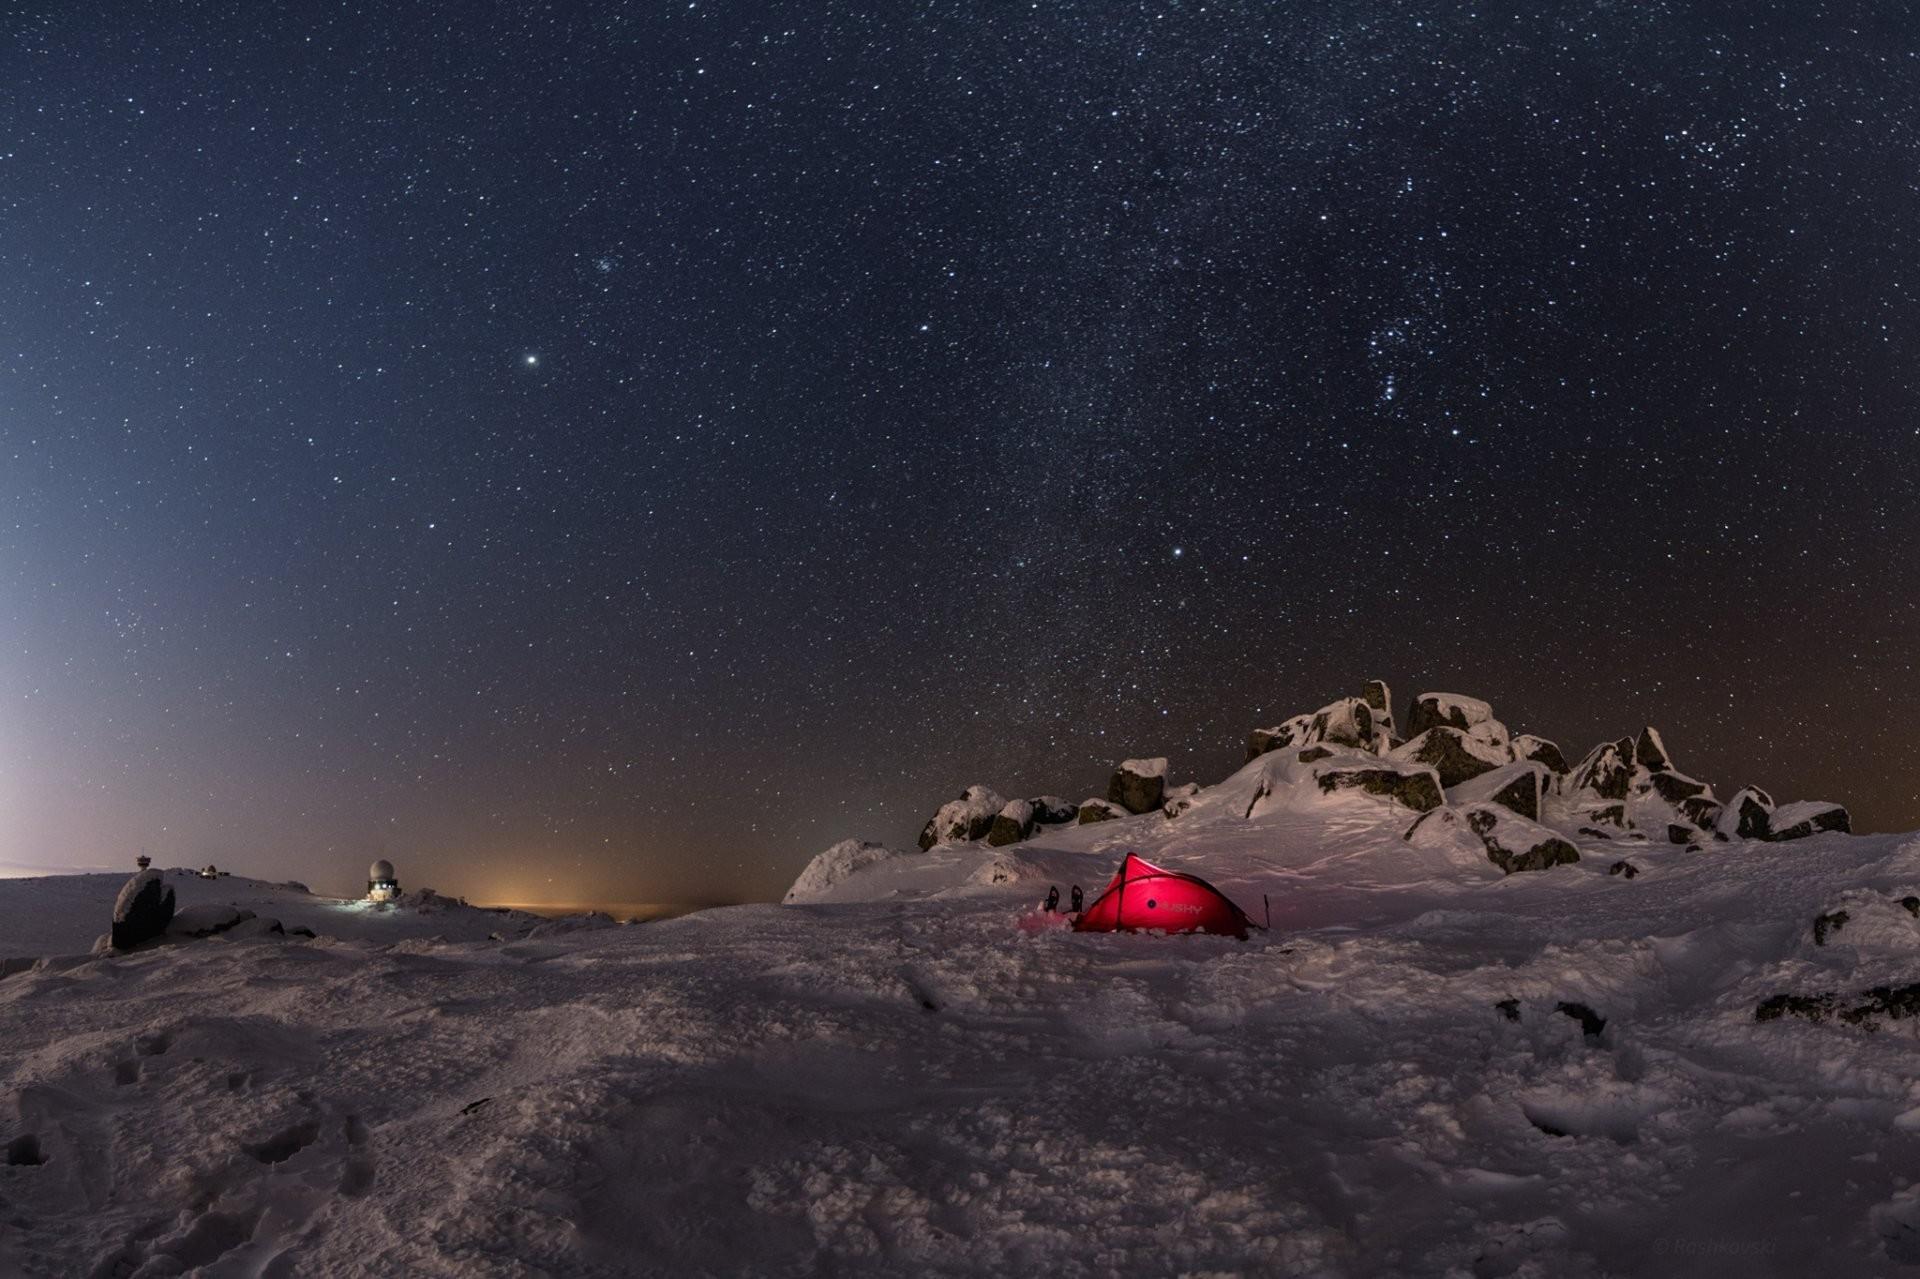 winter snow tent stones night sky star